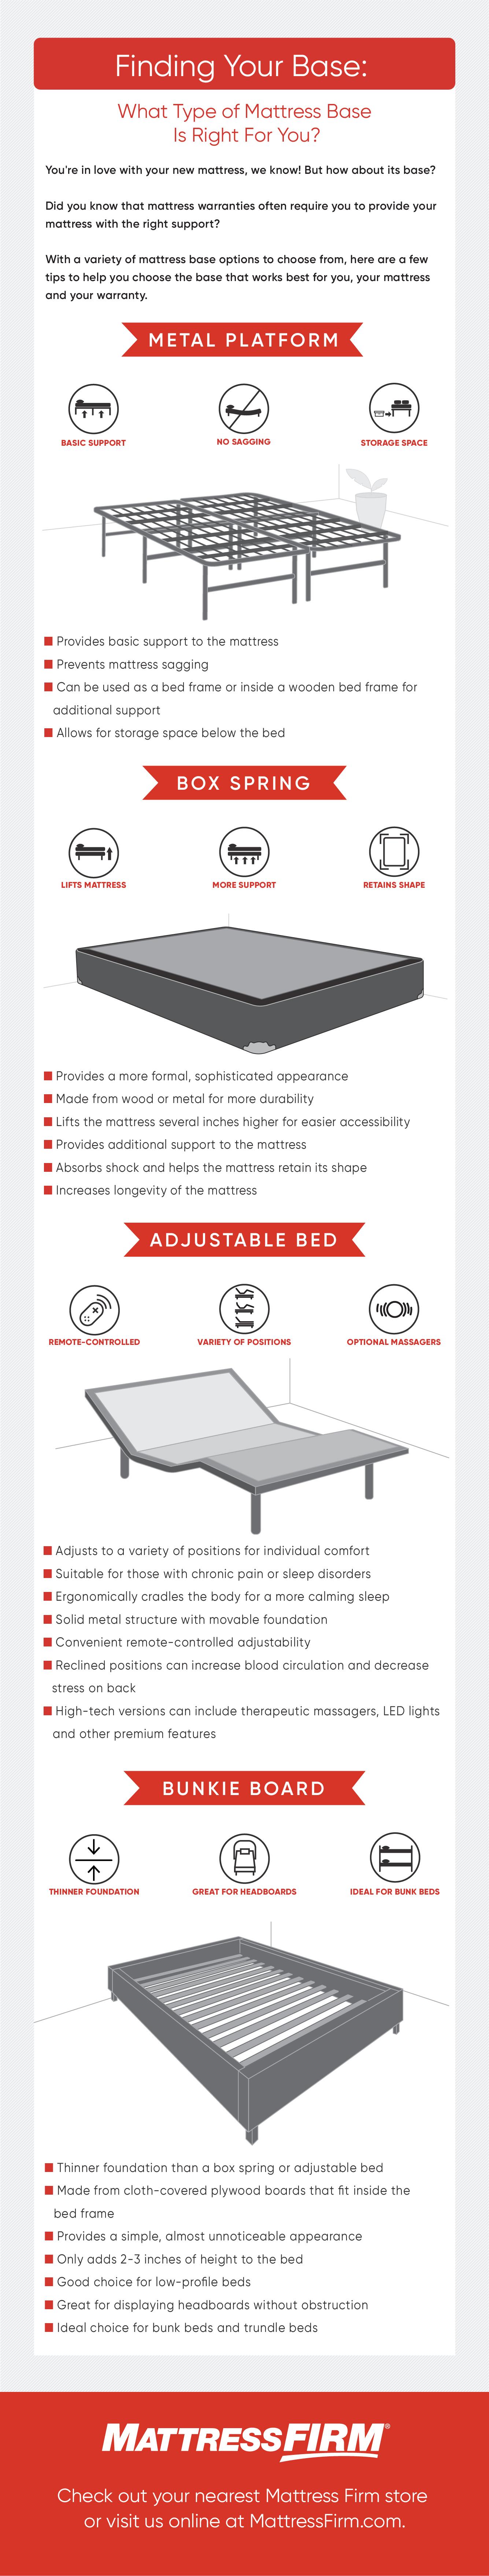 mattress base adjustable bed adjustable bed base what is a bunkie board memory foam mattress base adjustable mattress base